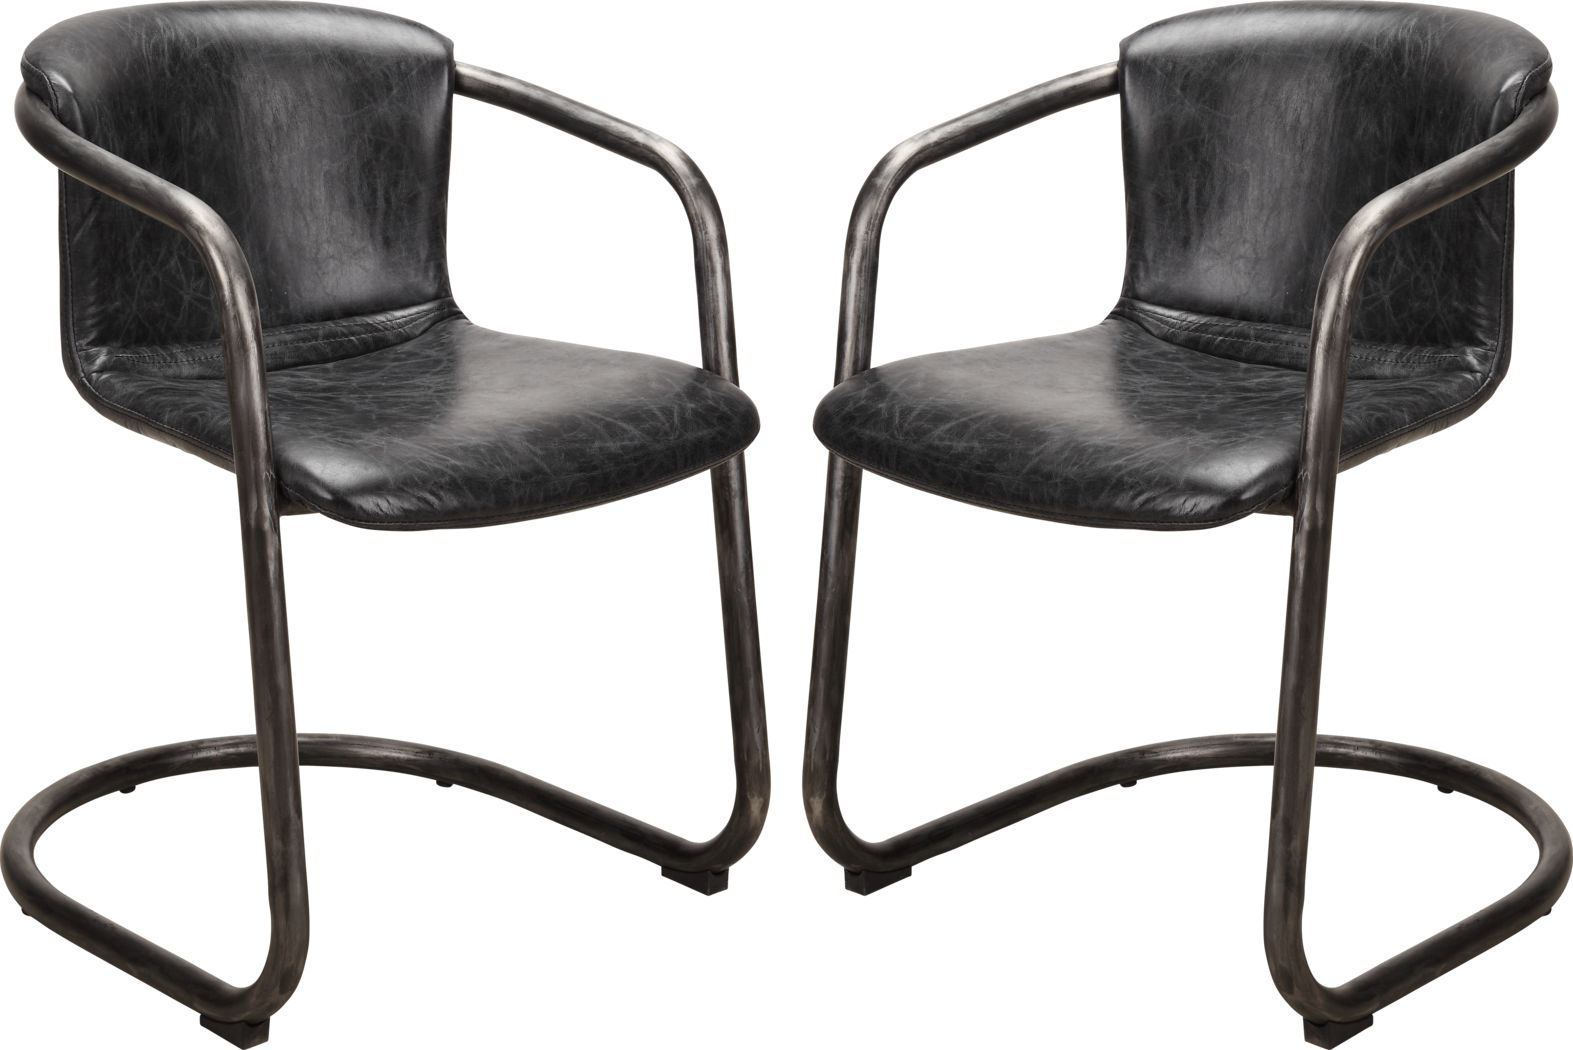 Flintcove Black Dining Chair (Set of 2)